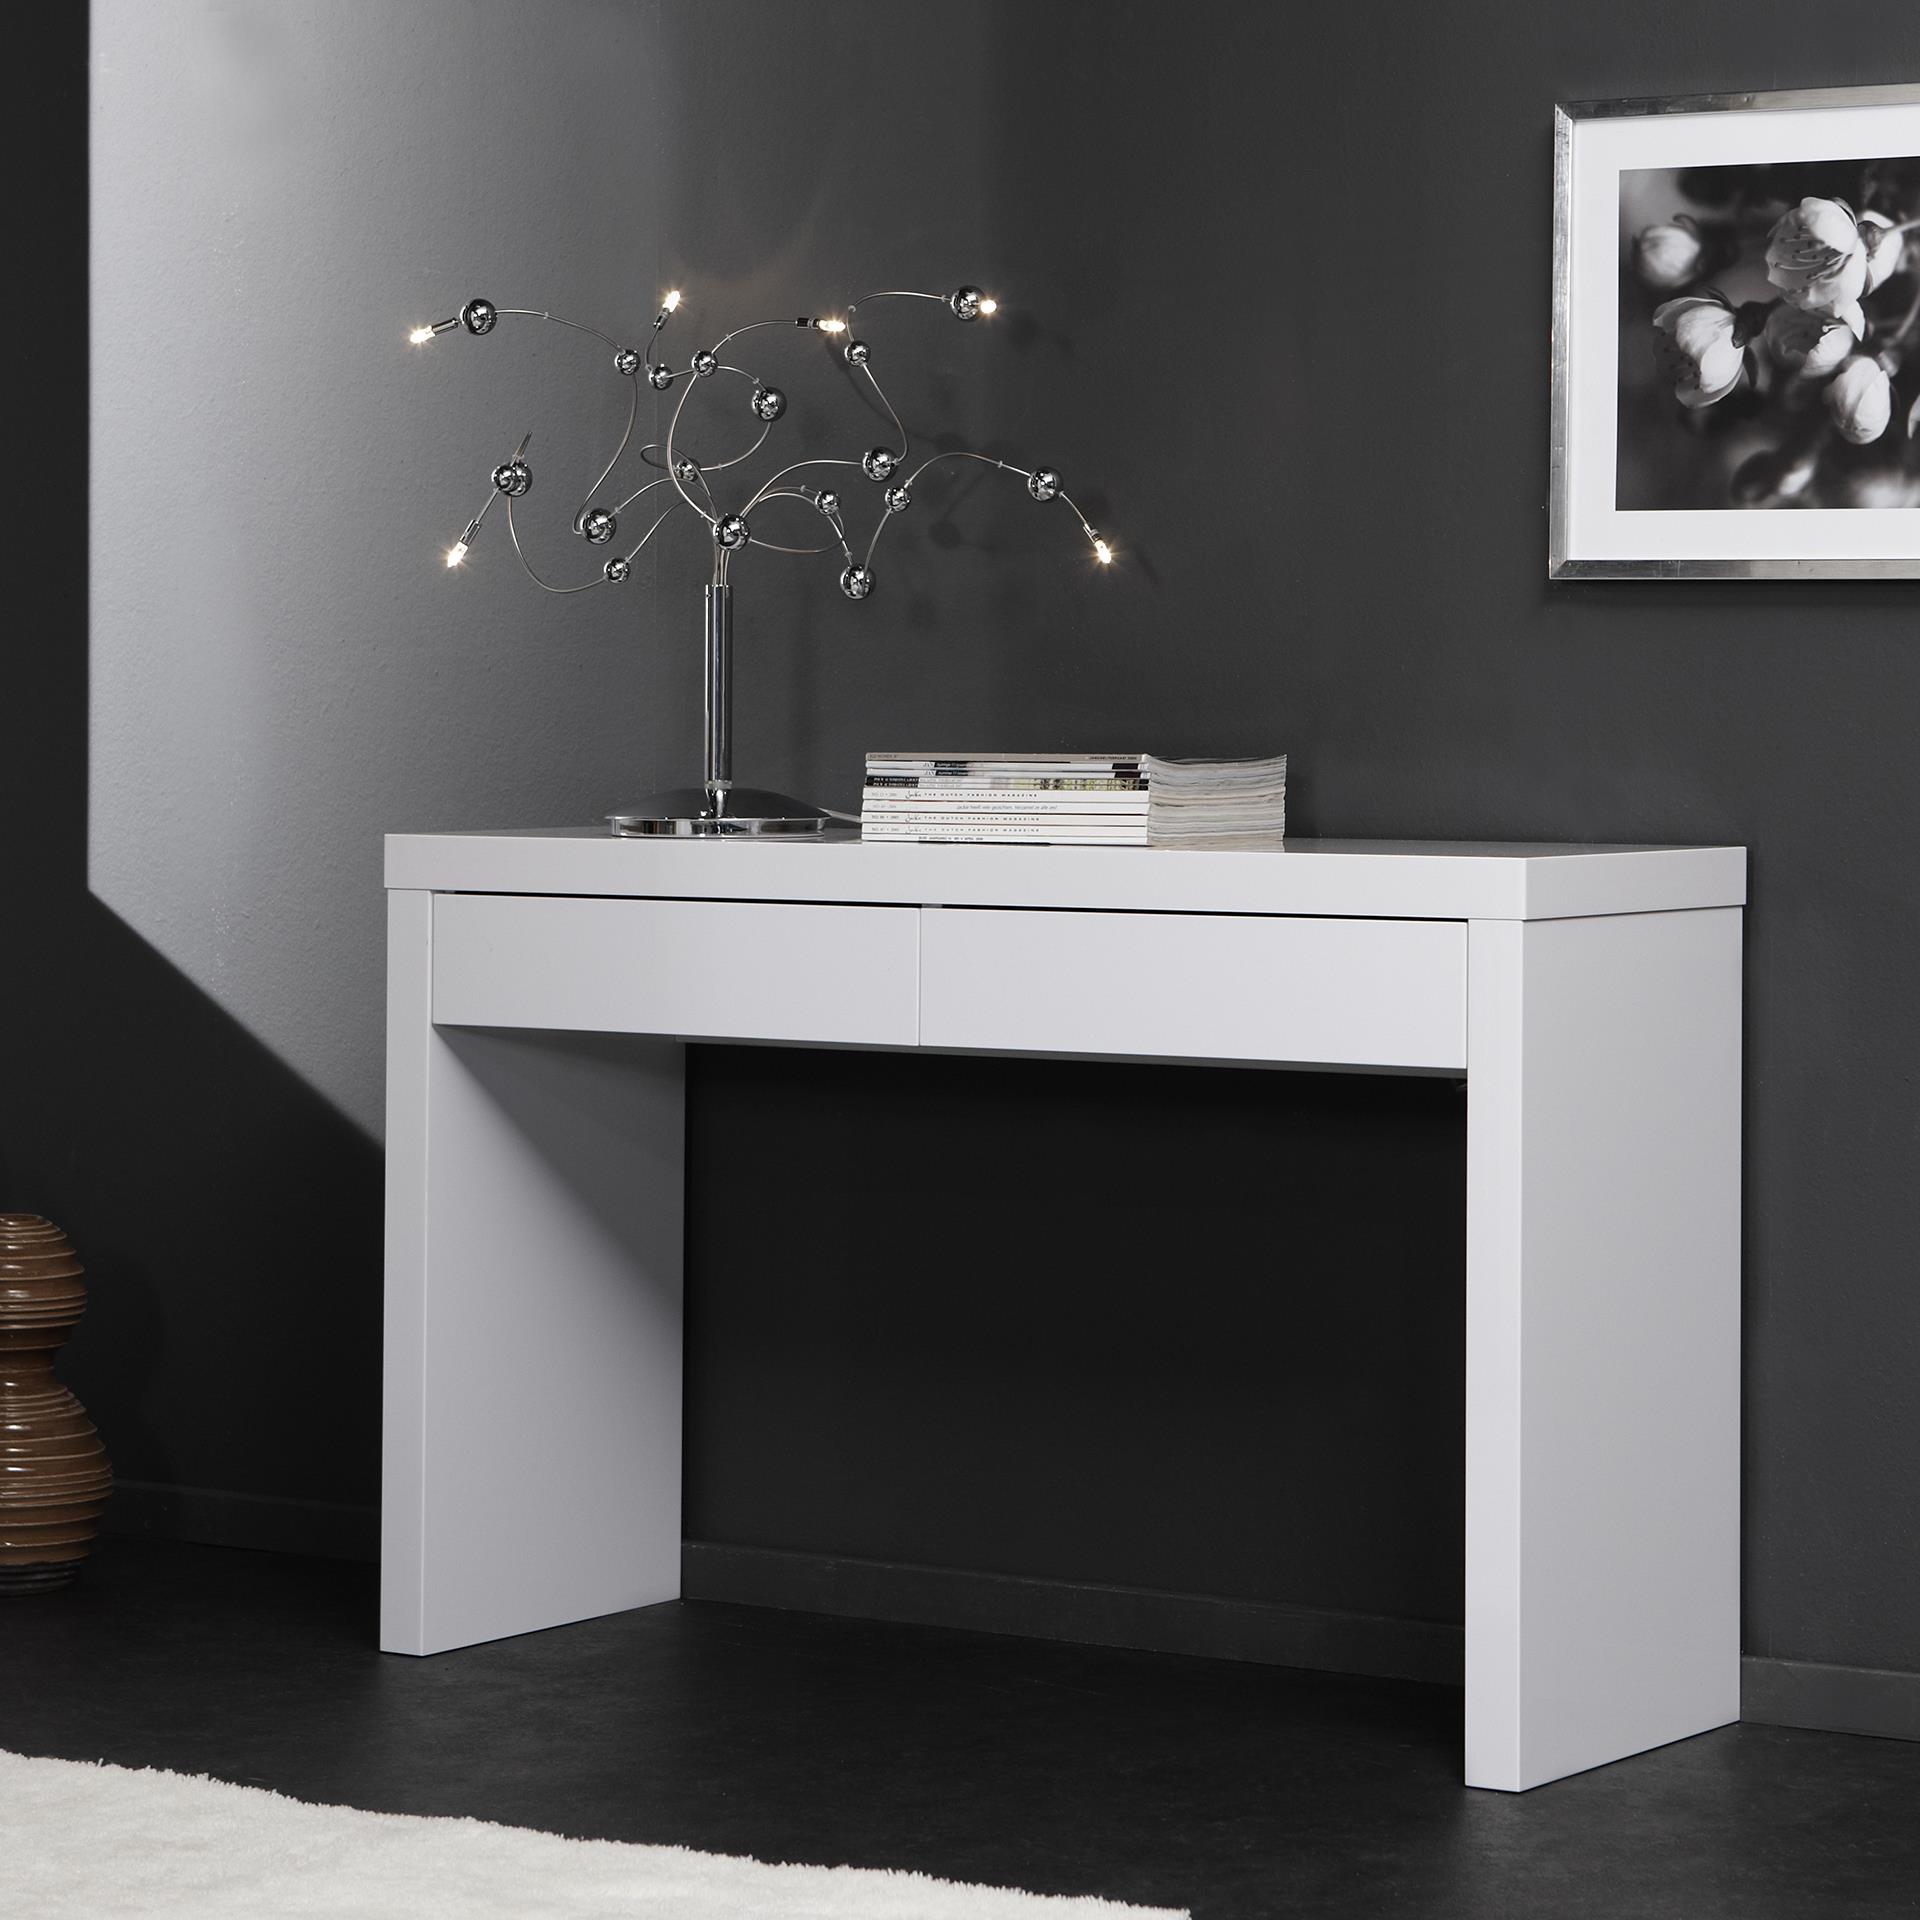 Witte Hoogglans Sidetable.Side Table Wit Latest Awesome Baroque Sidetable Klassieke Stijl Wit